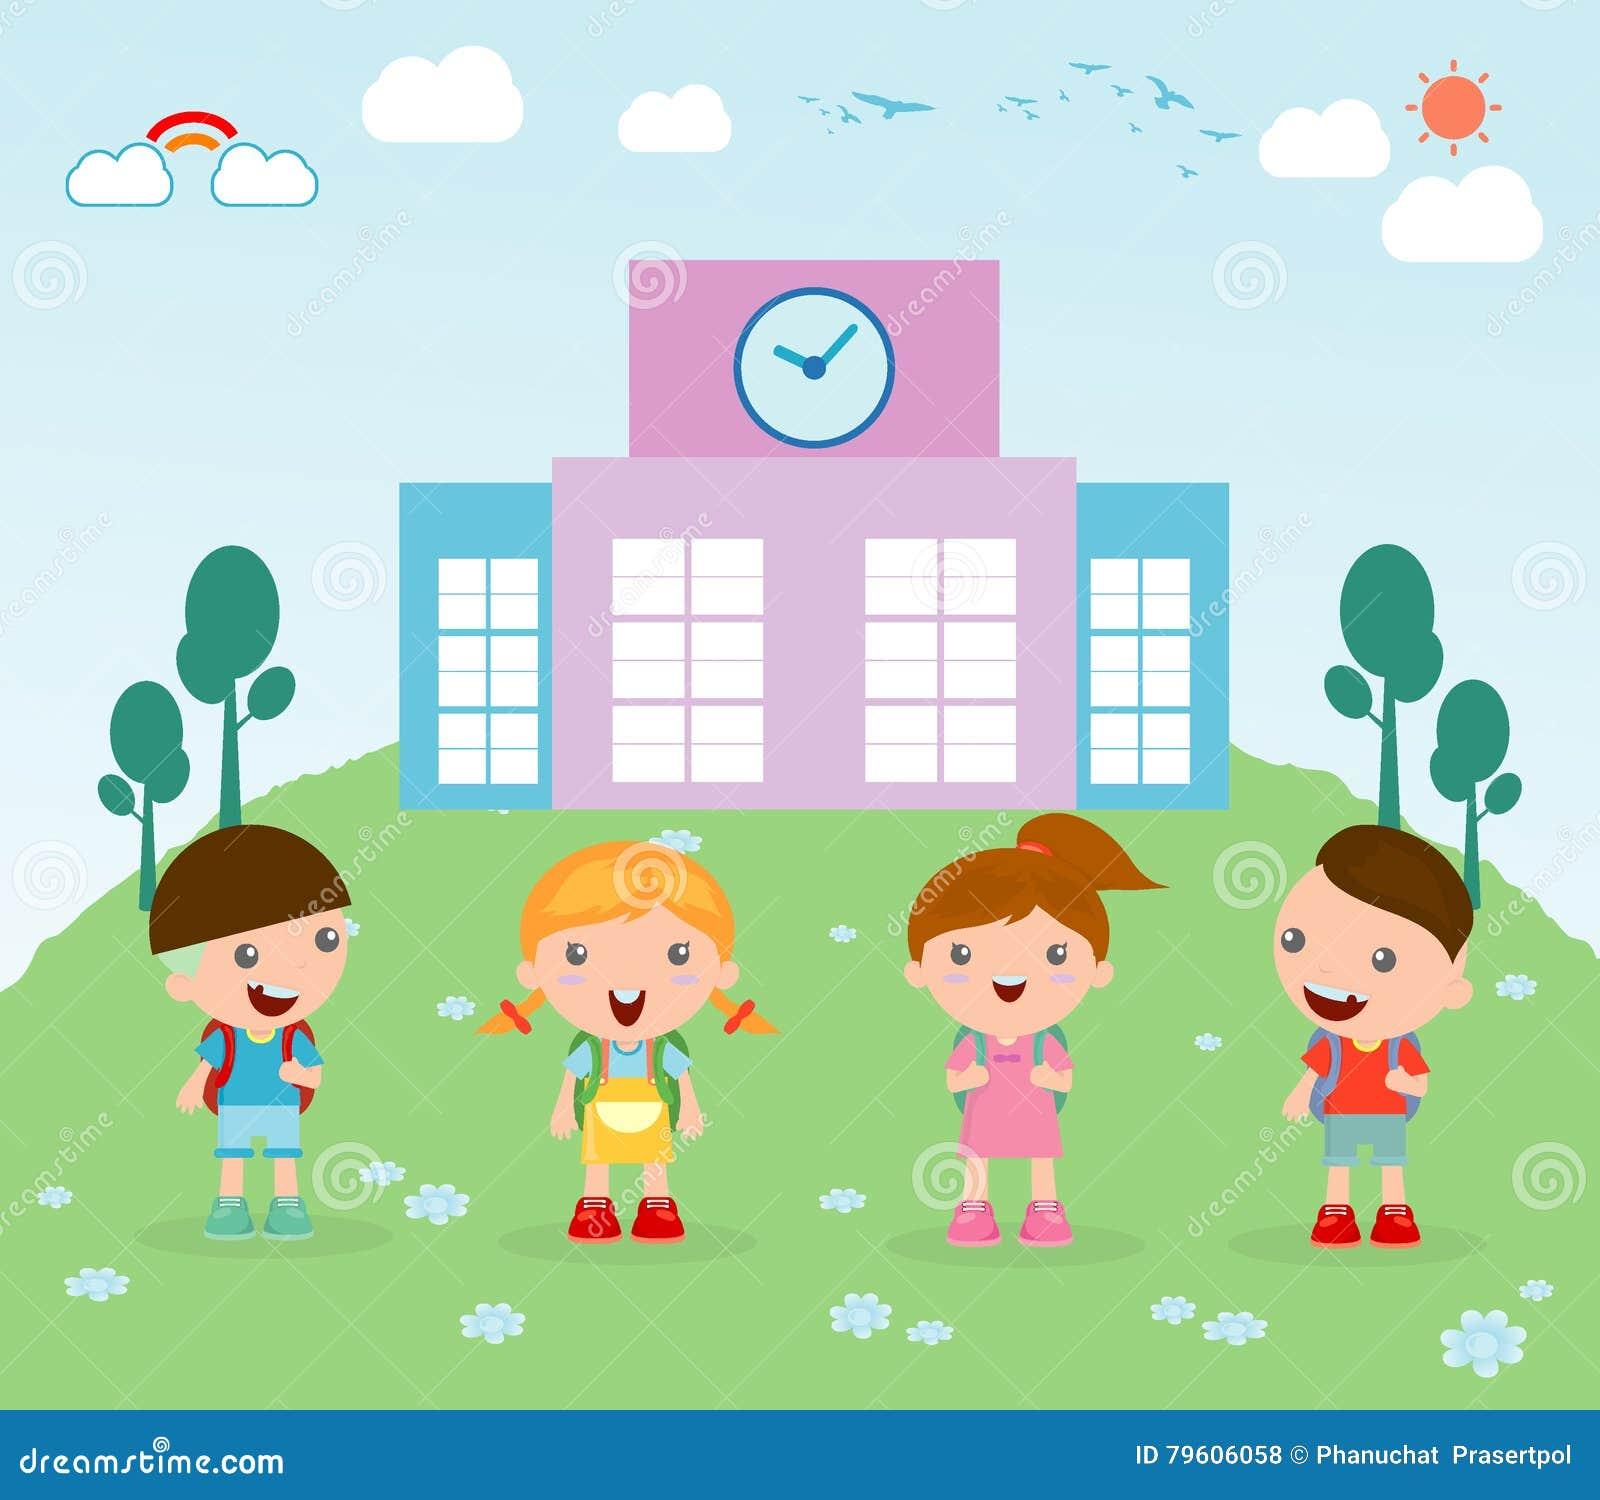 Cartoon Child - Illustration For The Children Stock Illustration ...